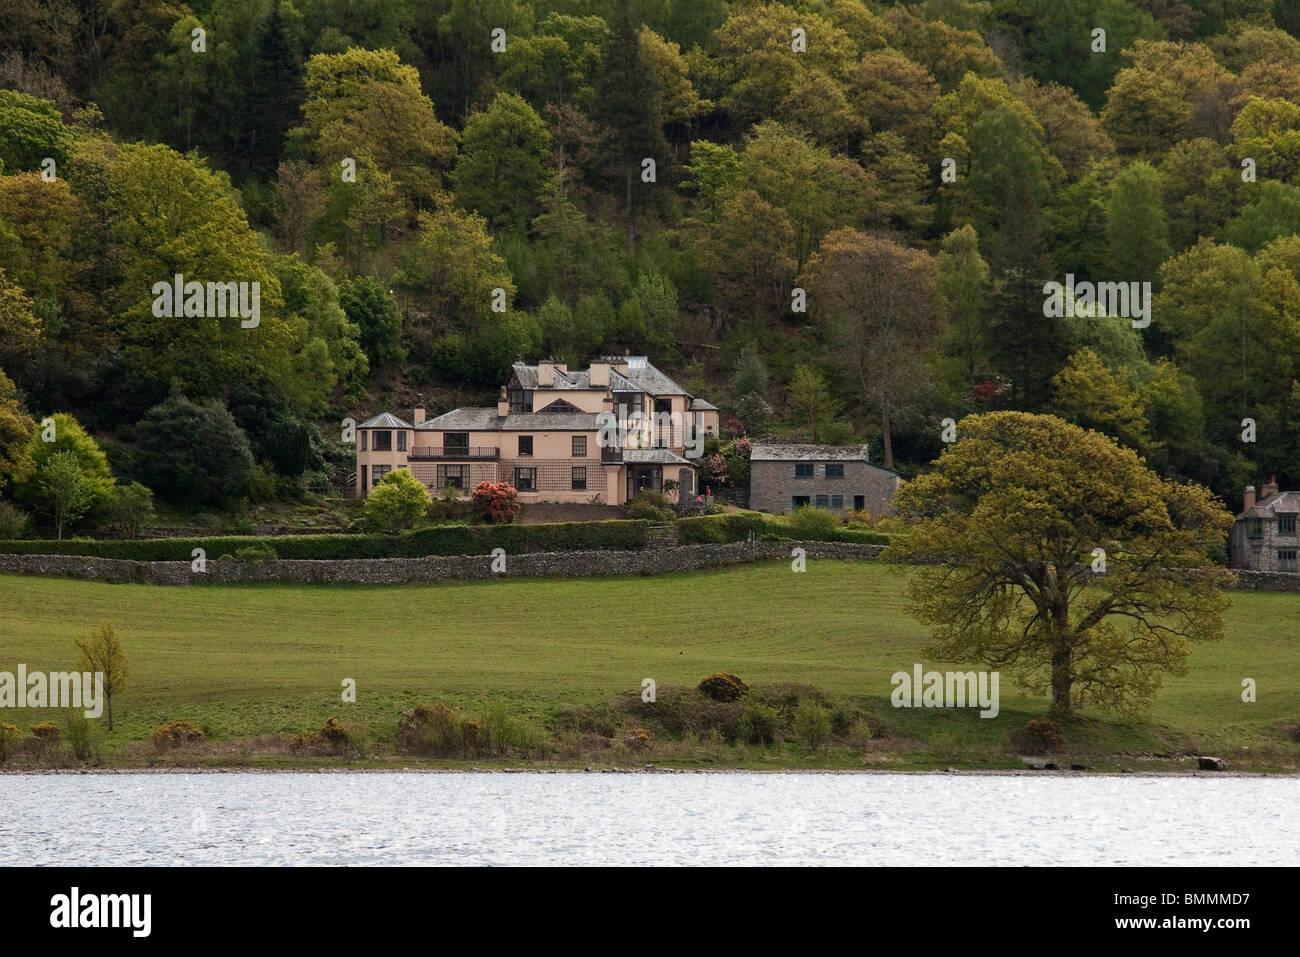 John Ruskin's house, England. - Stock Image